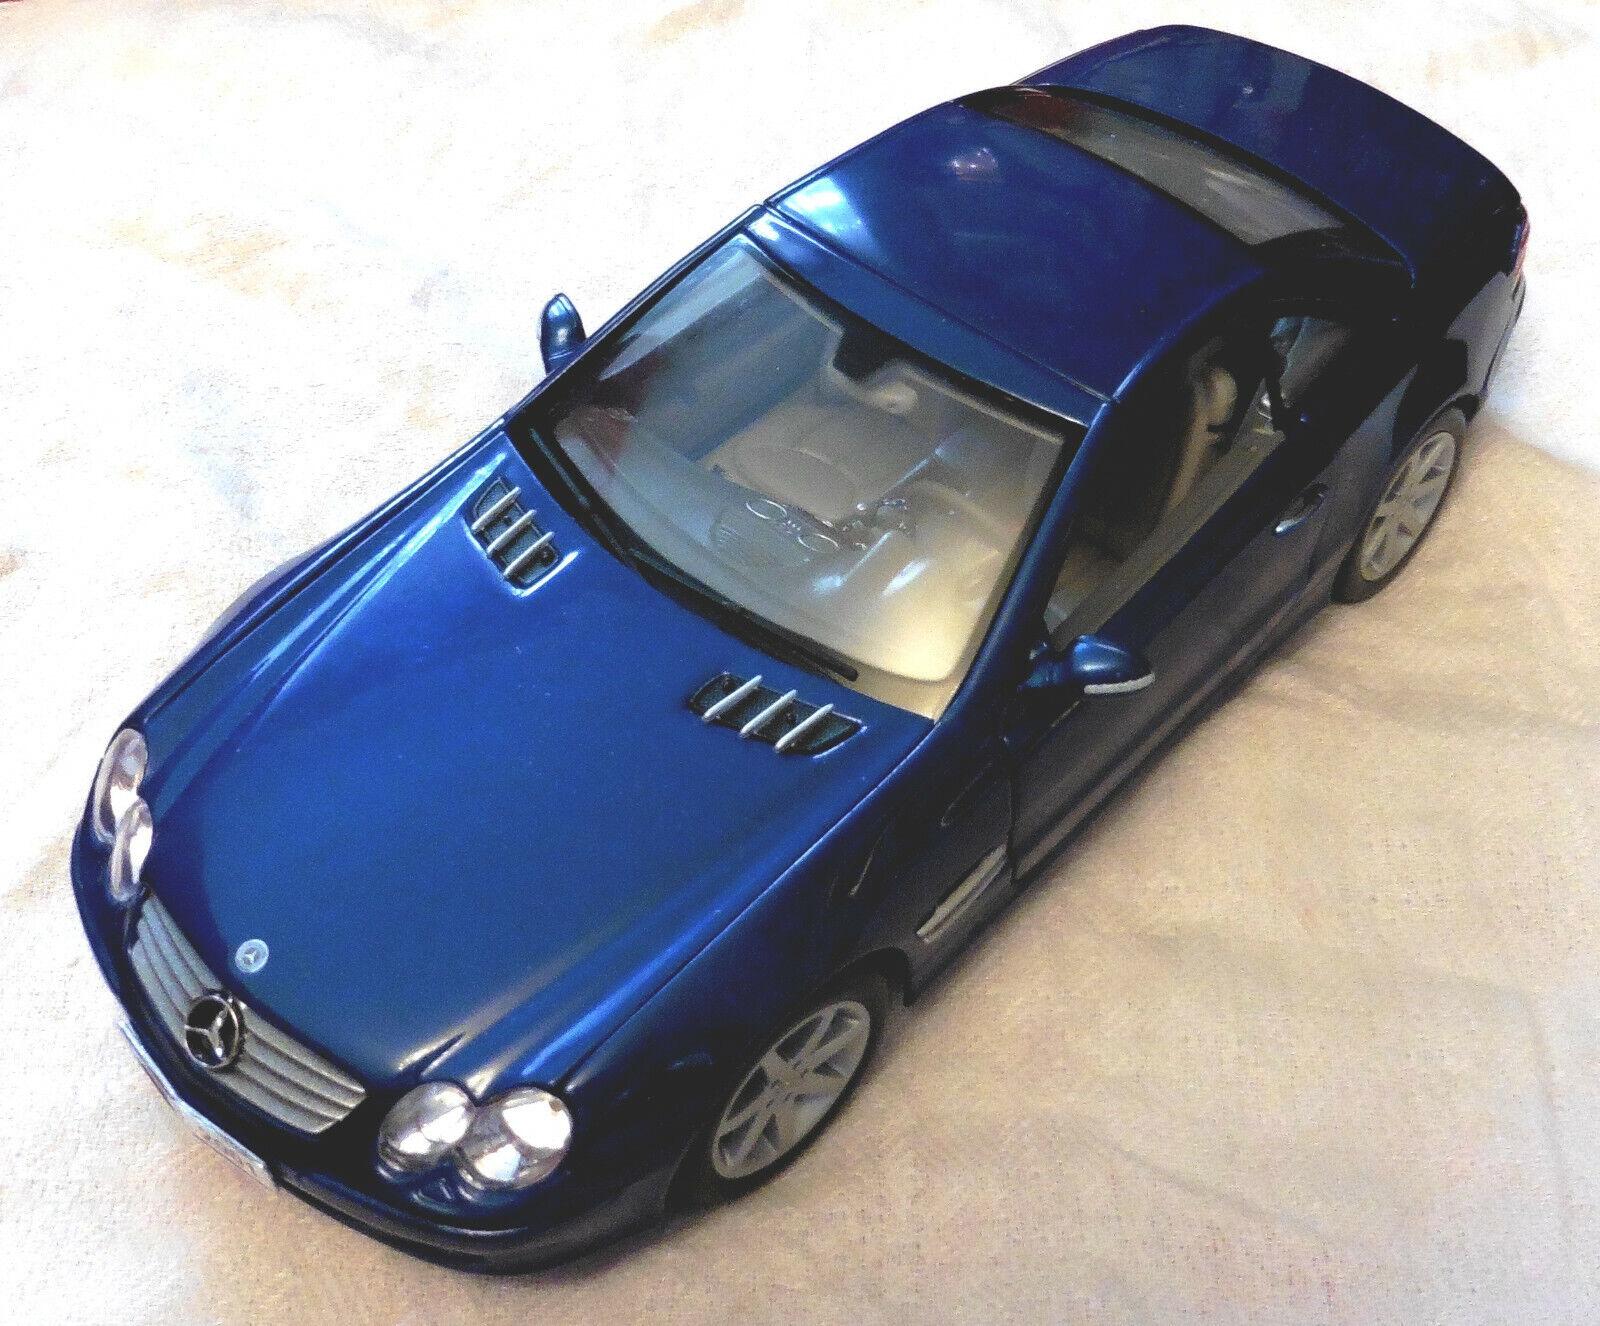 MAISTO Mercedes-Benz SL Klasse 2001, 1 18, mint